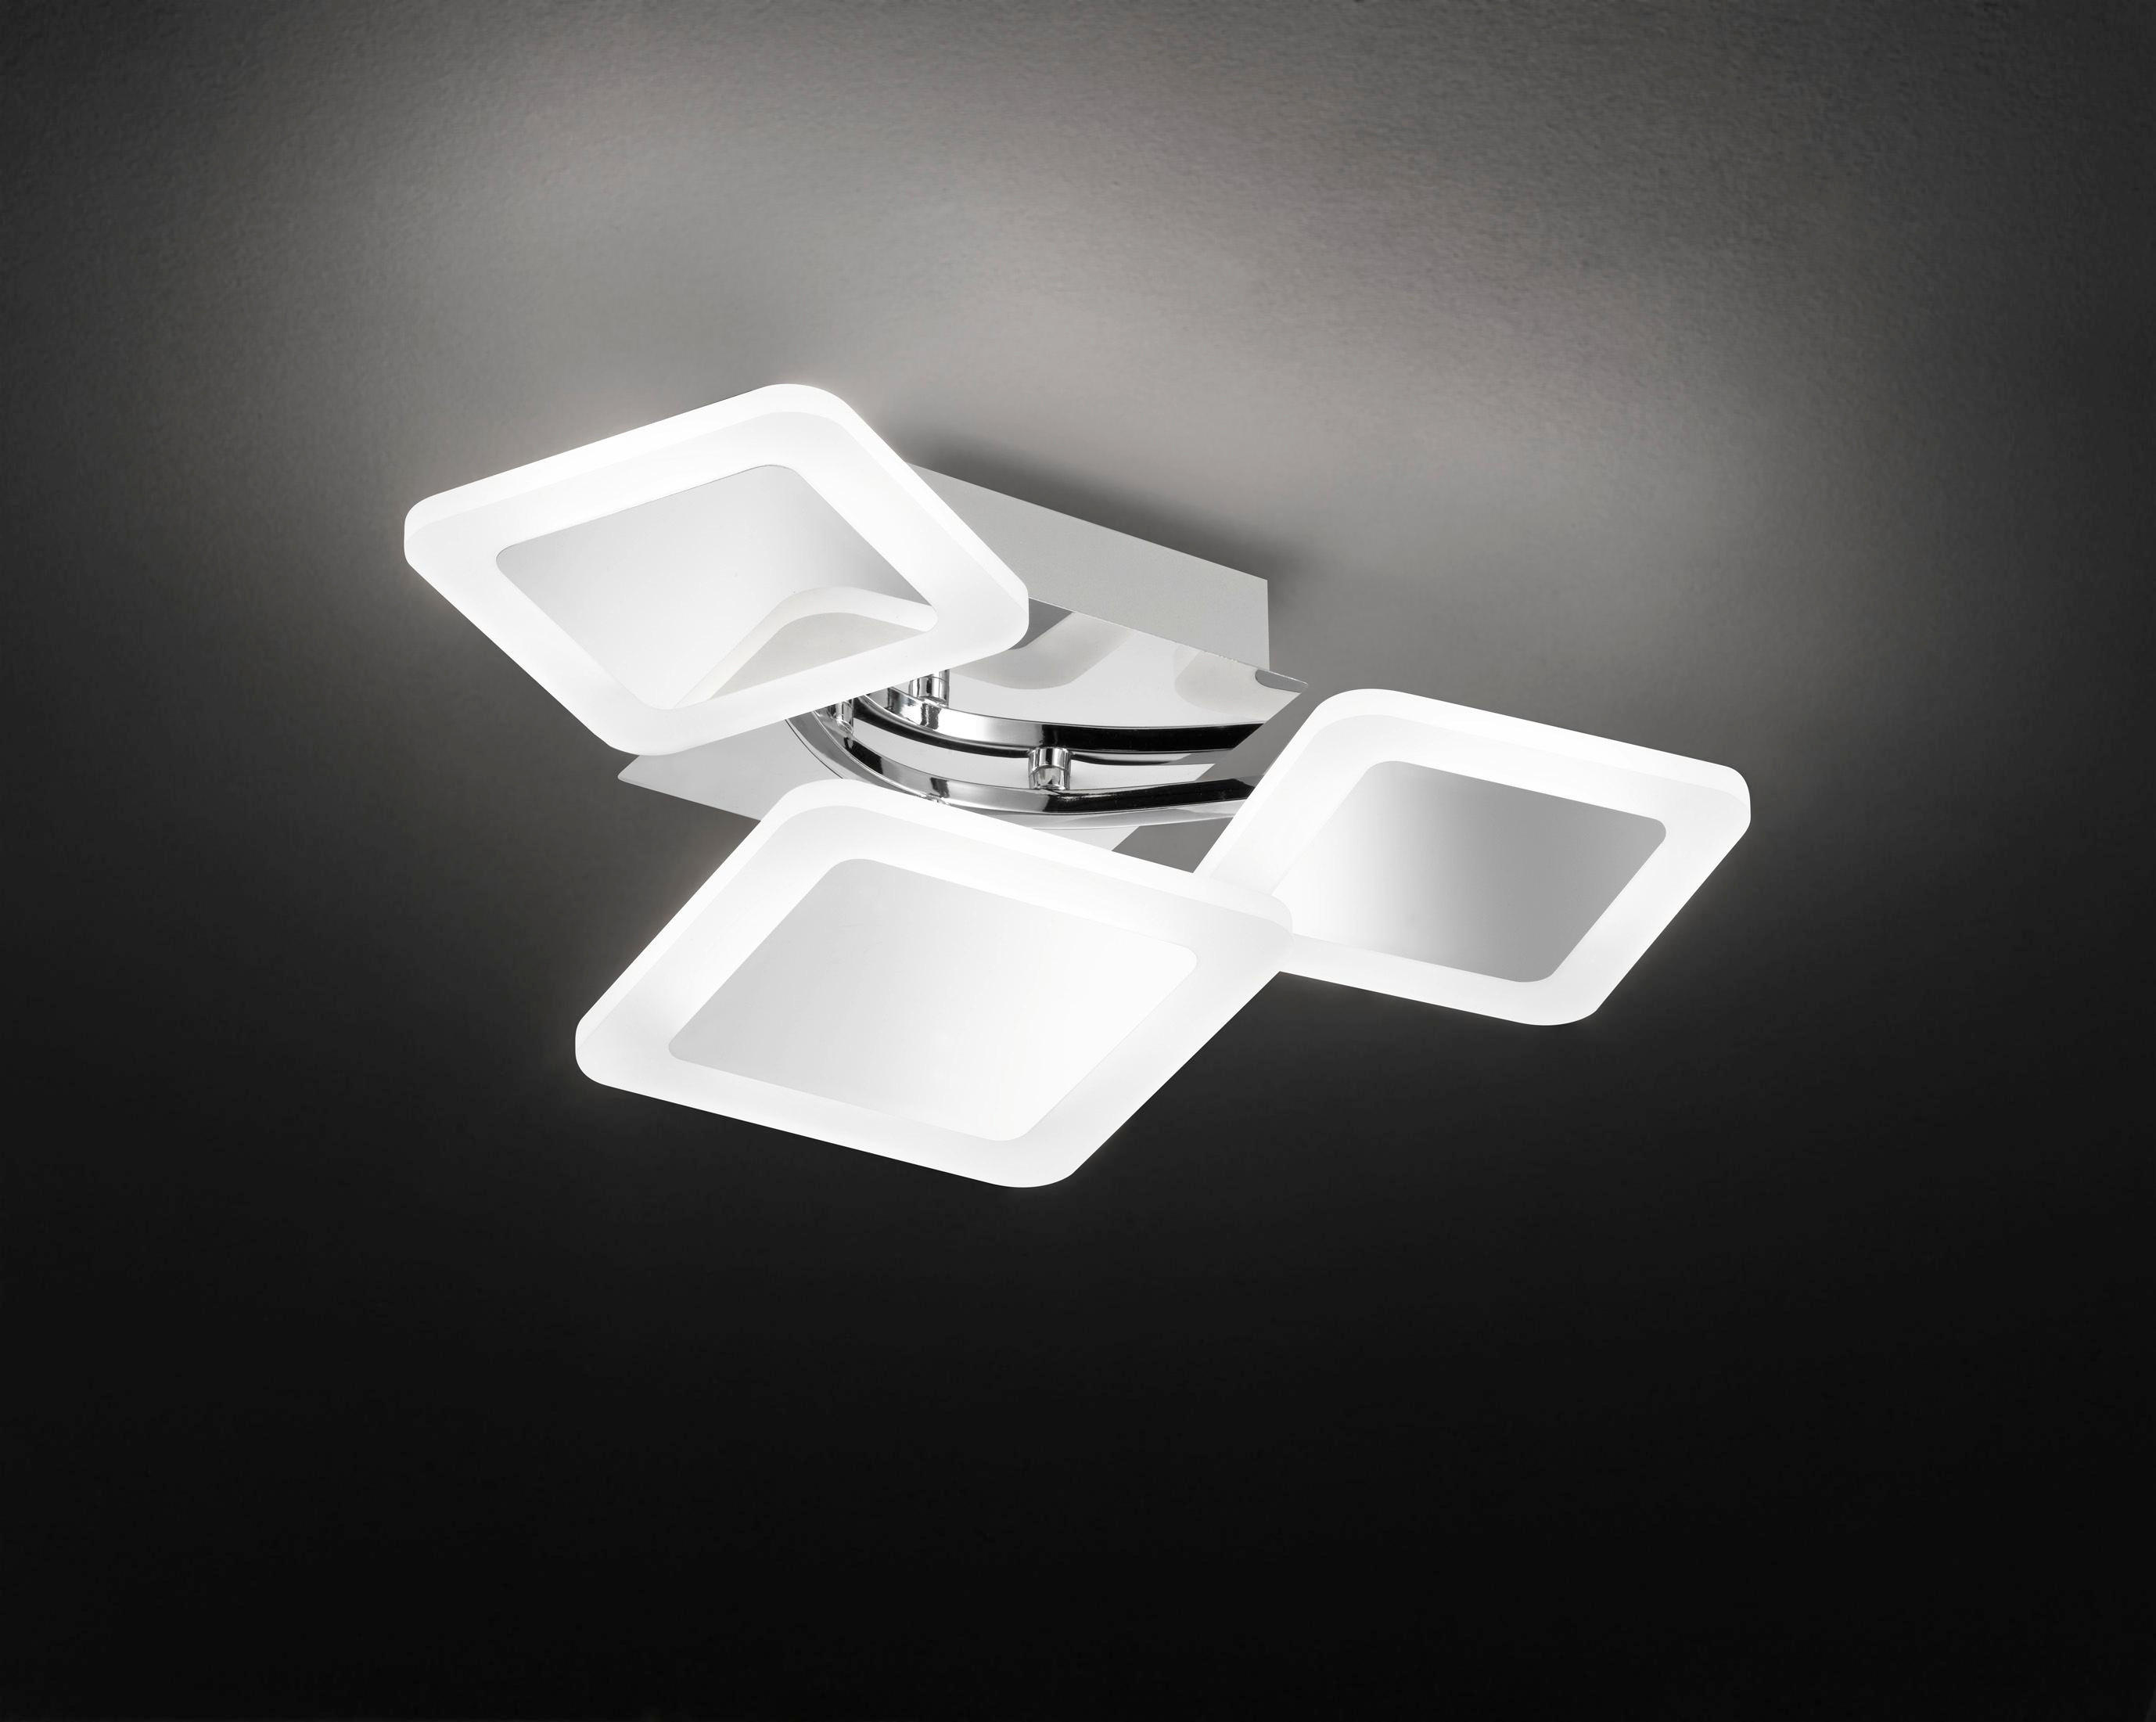 LED-DECKENLEUCHTE - Chromfarben, Design, Kunststoff/Metall (24,5/10,5/16,5cm)